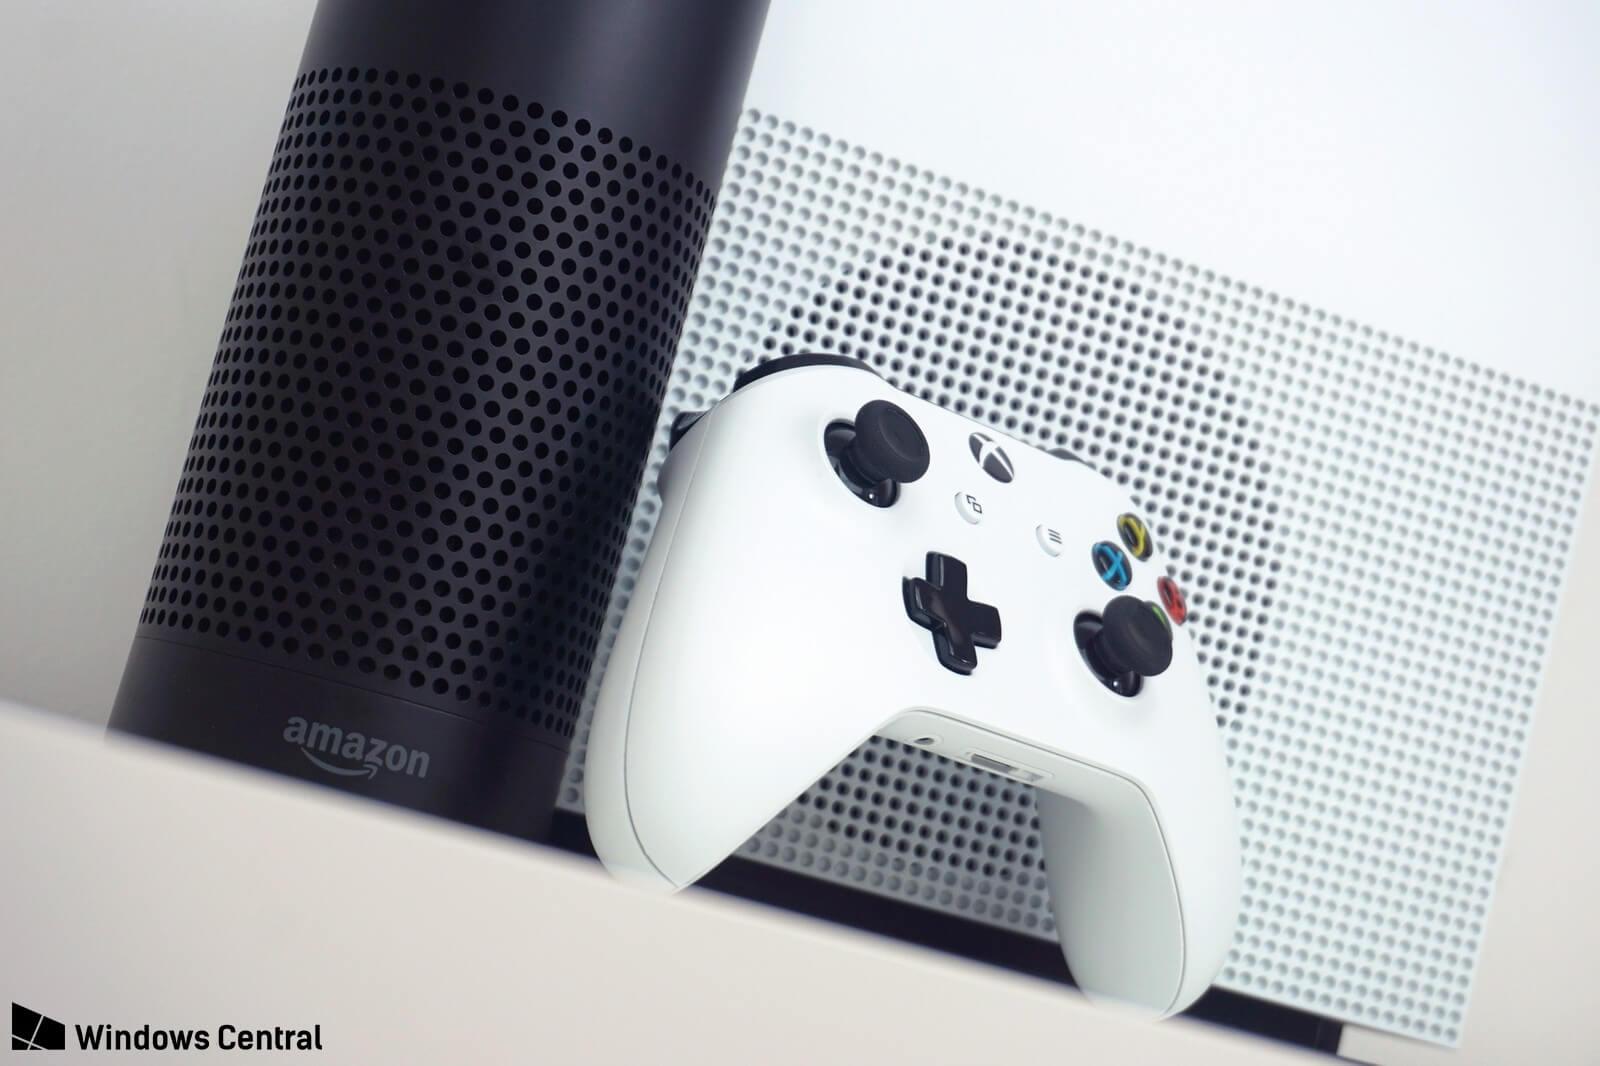 Xbox one amazon echo hero